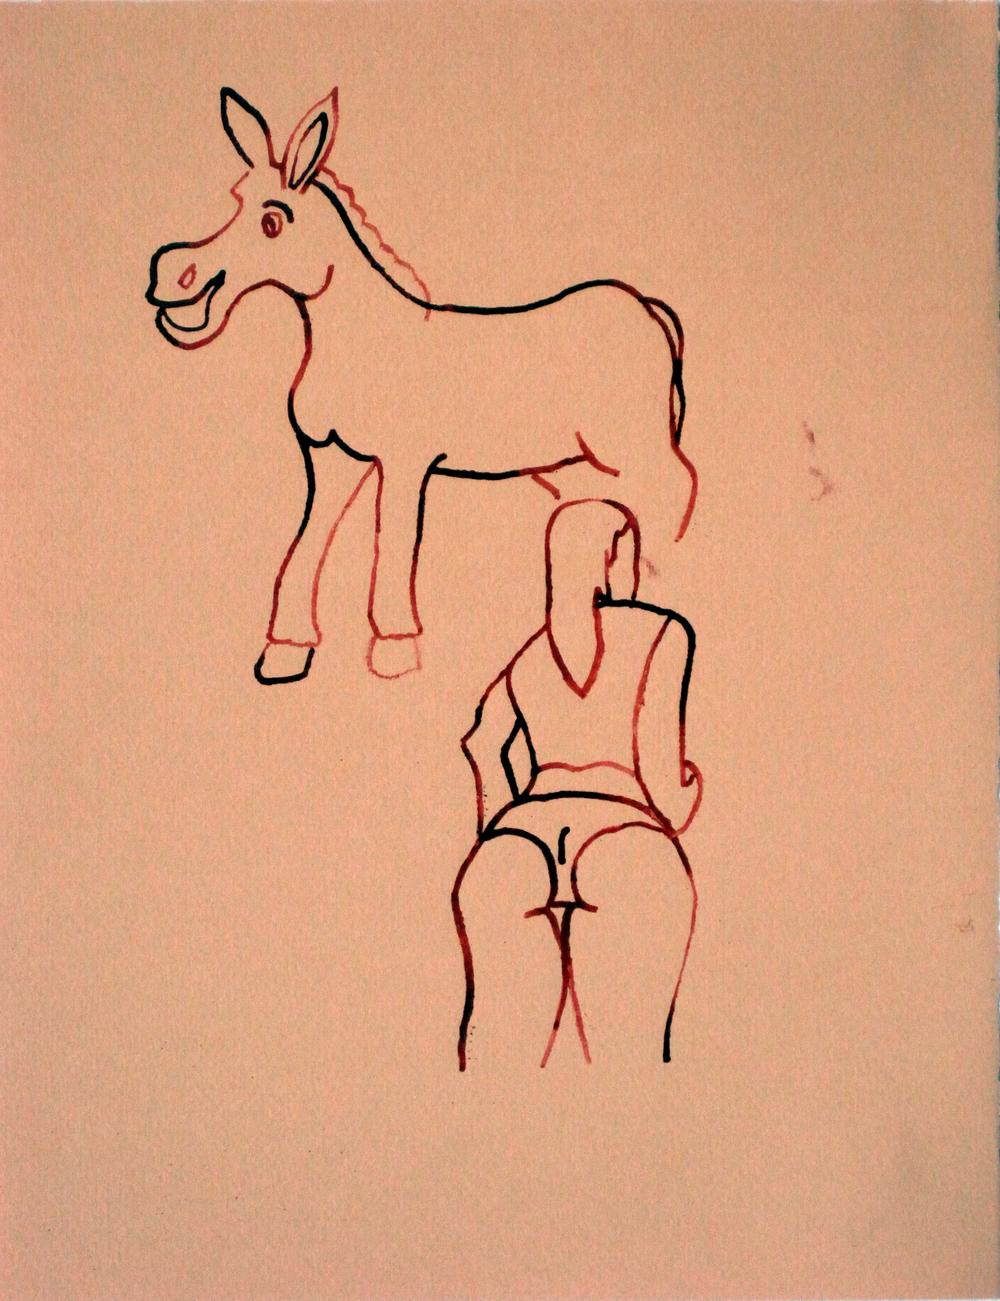 0883 The Donkey's Ass.JPG